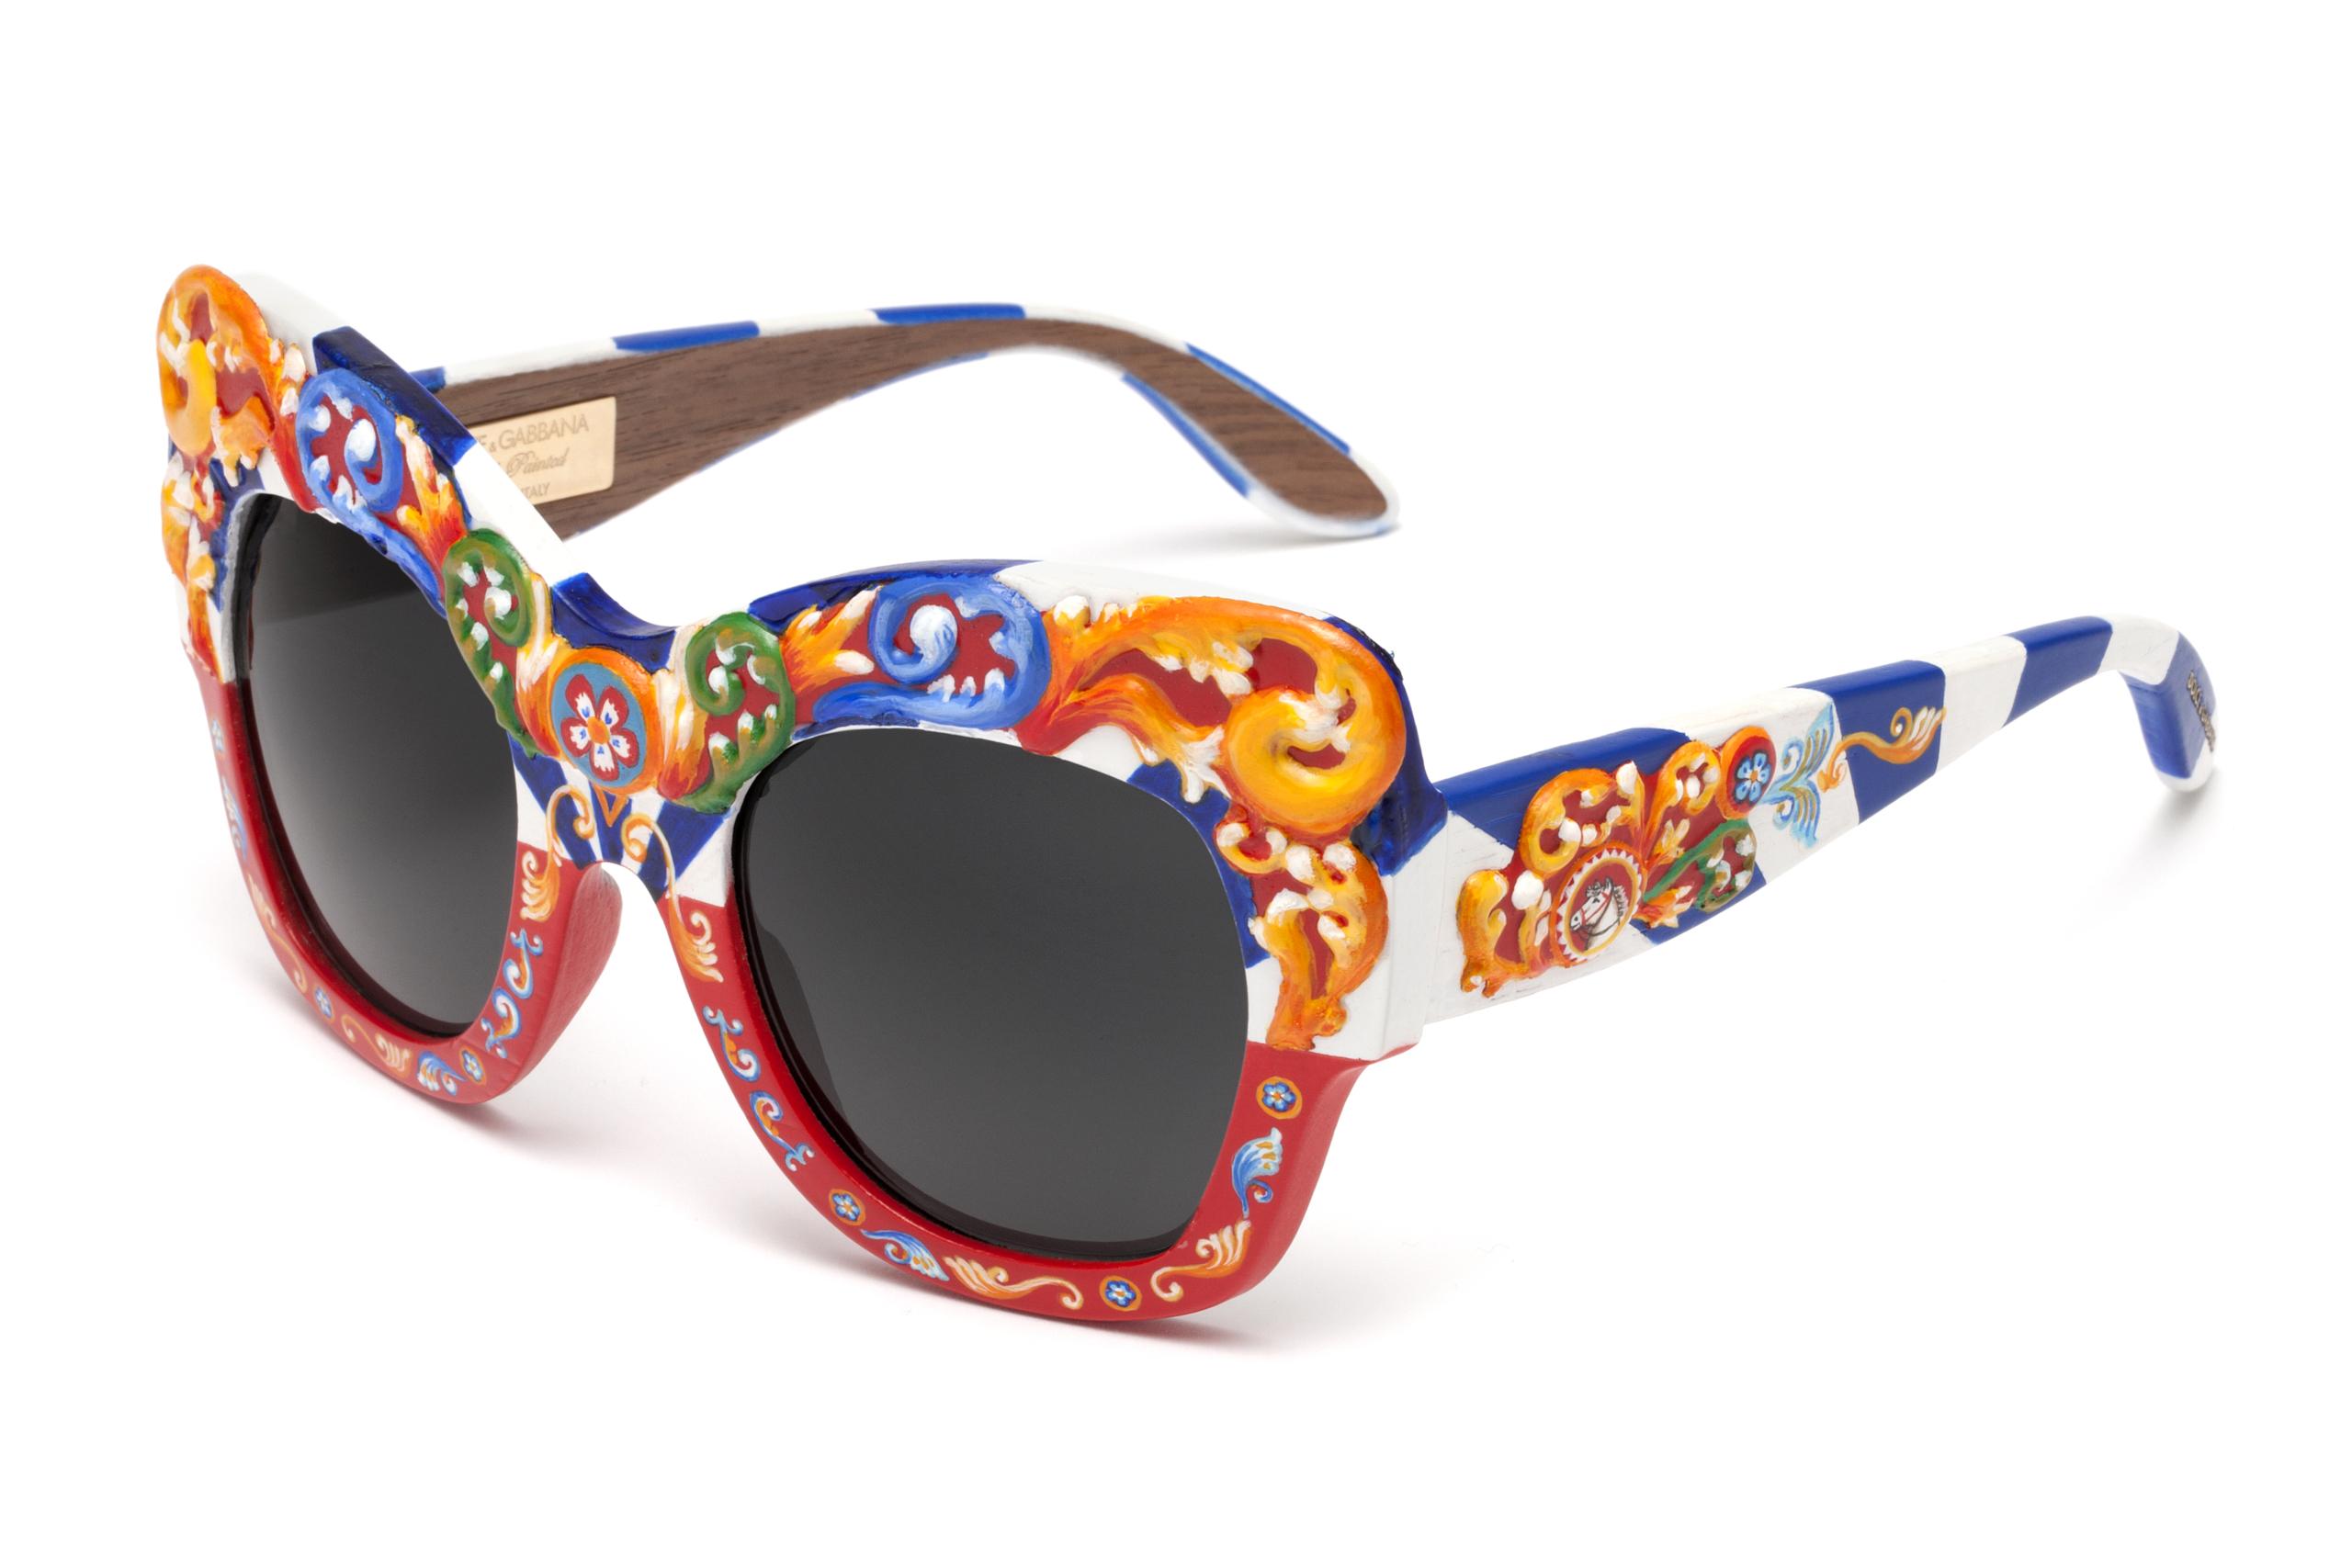 Foto de Gafas de sol Dolce Gabbana Sicilian Carretto (11/12)